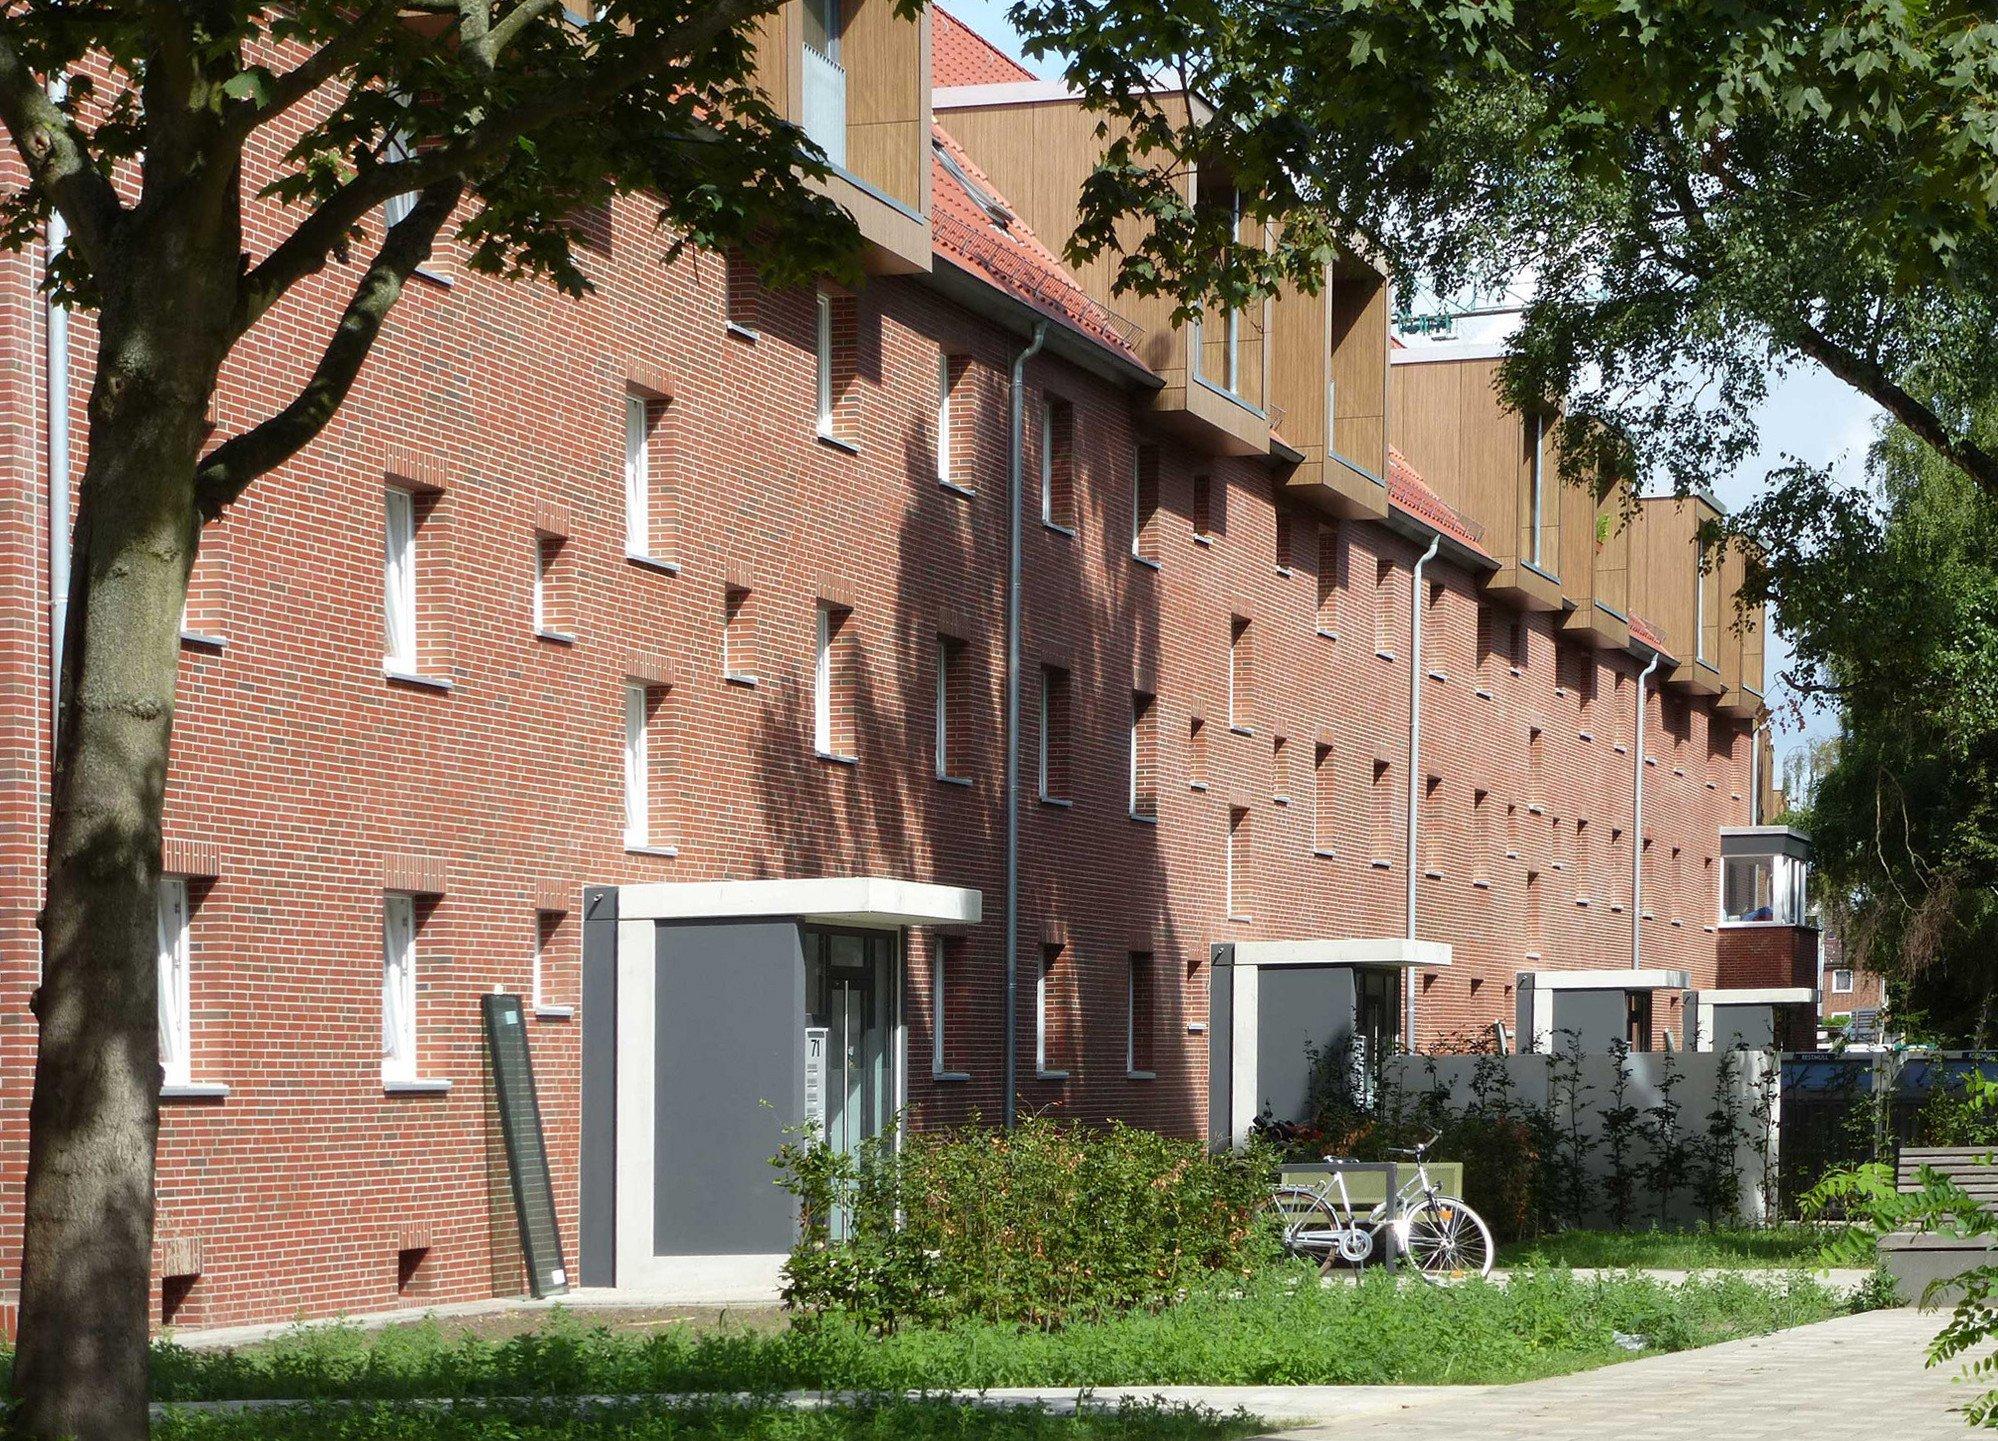 Dachgeschossausbau Hamburg brandschutz im dachgeschossausbau brandschutz baustoffe bauteile